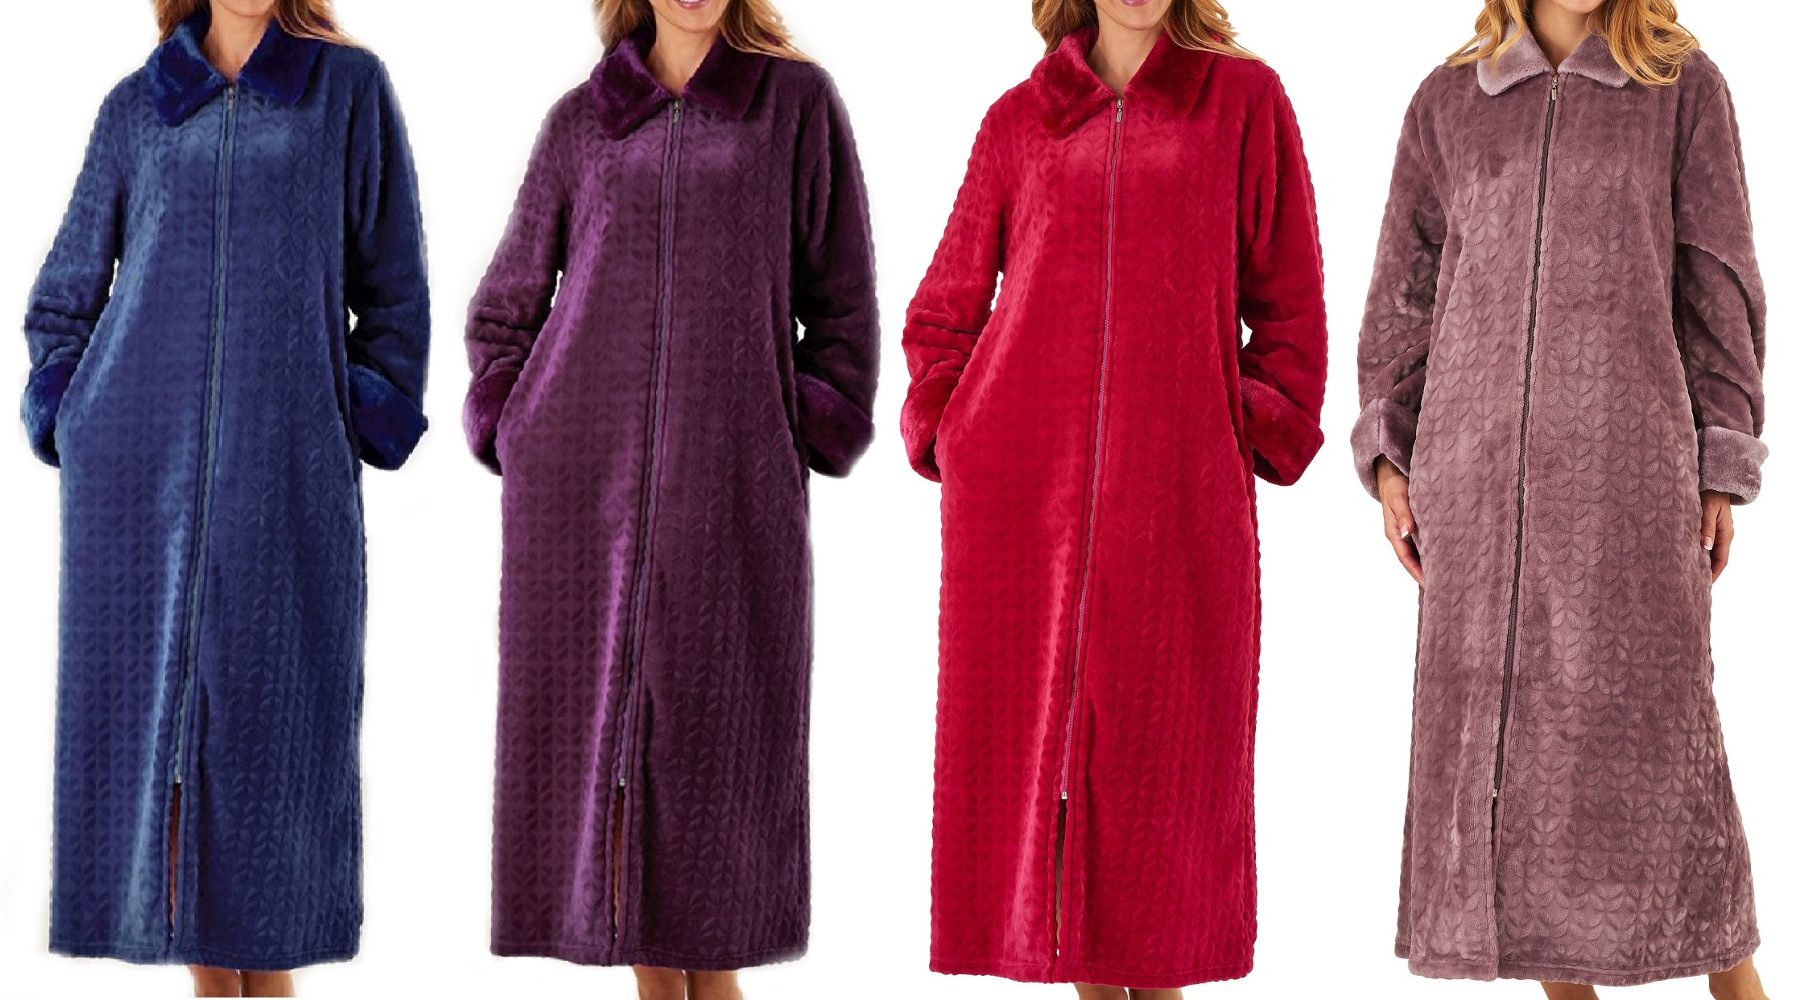 Slenderella Ladies Zip Up Dressing Gown Super Soft Faux Fur Collar ...